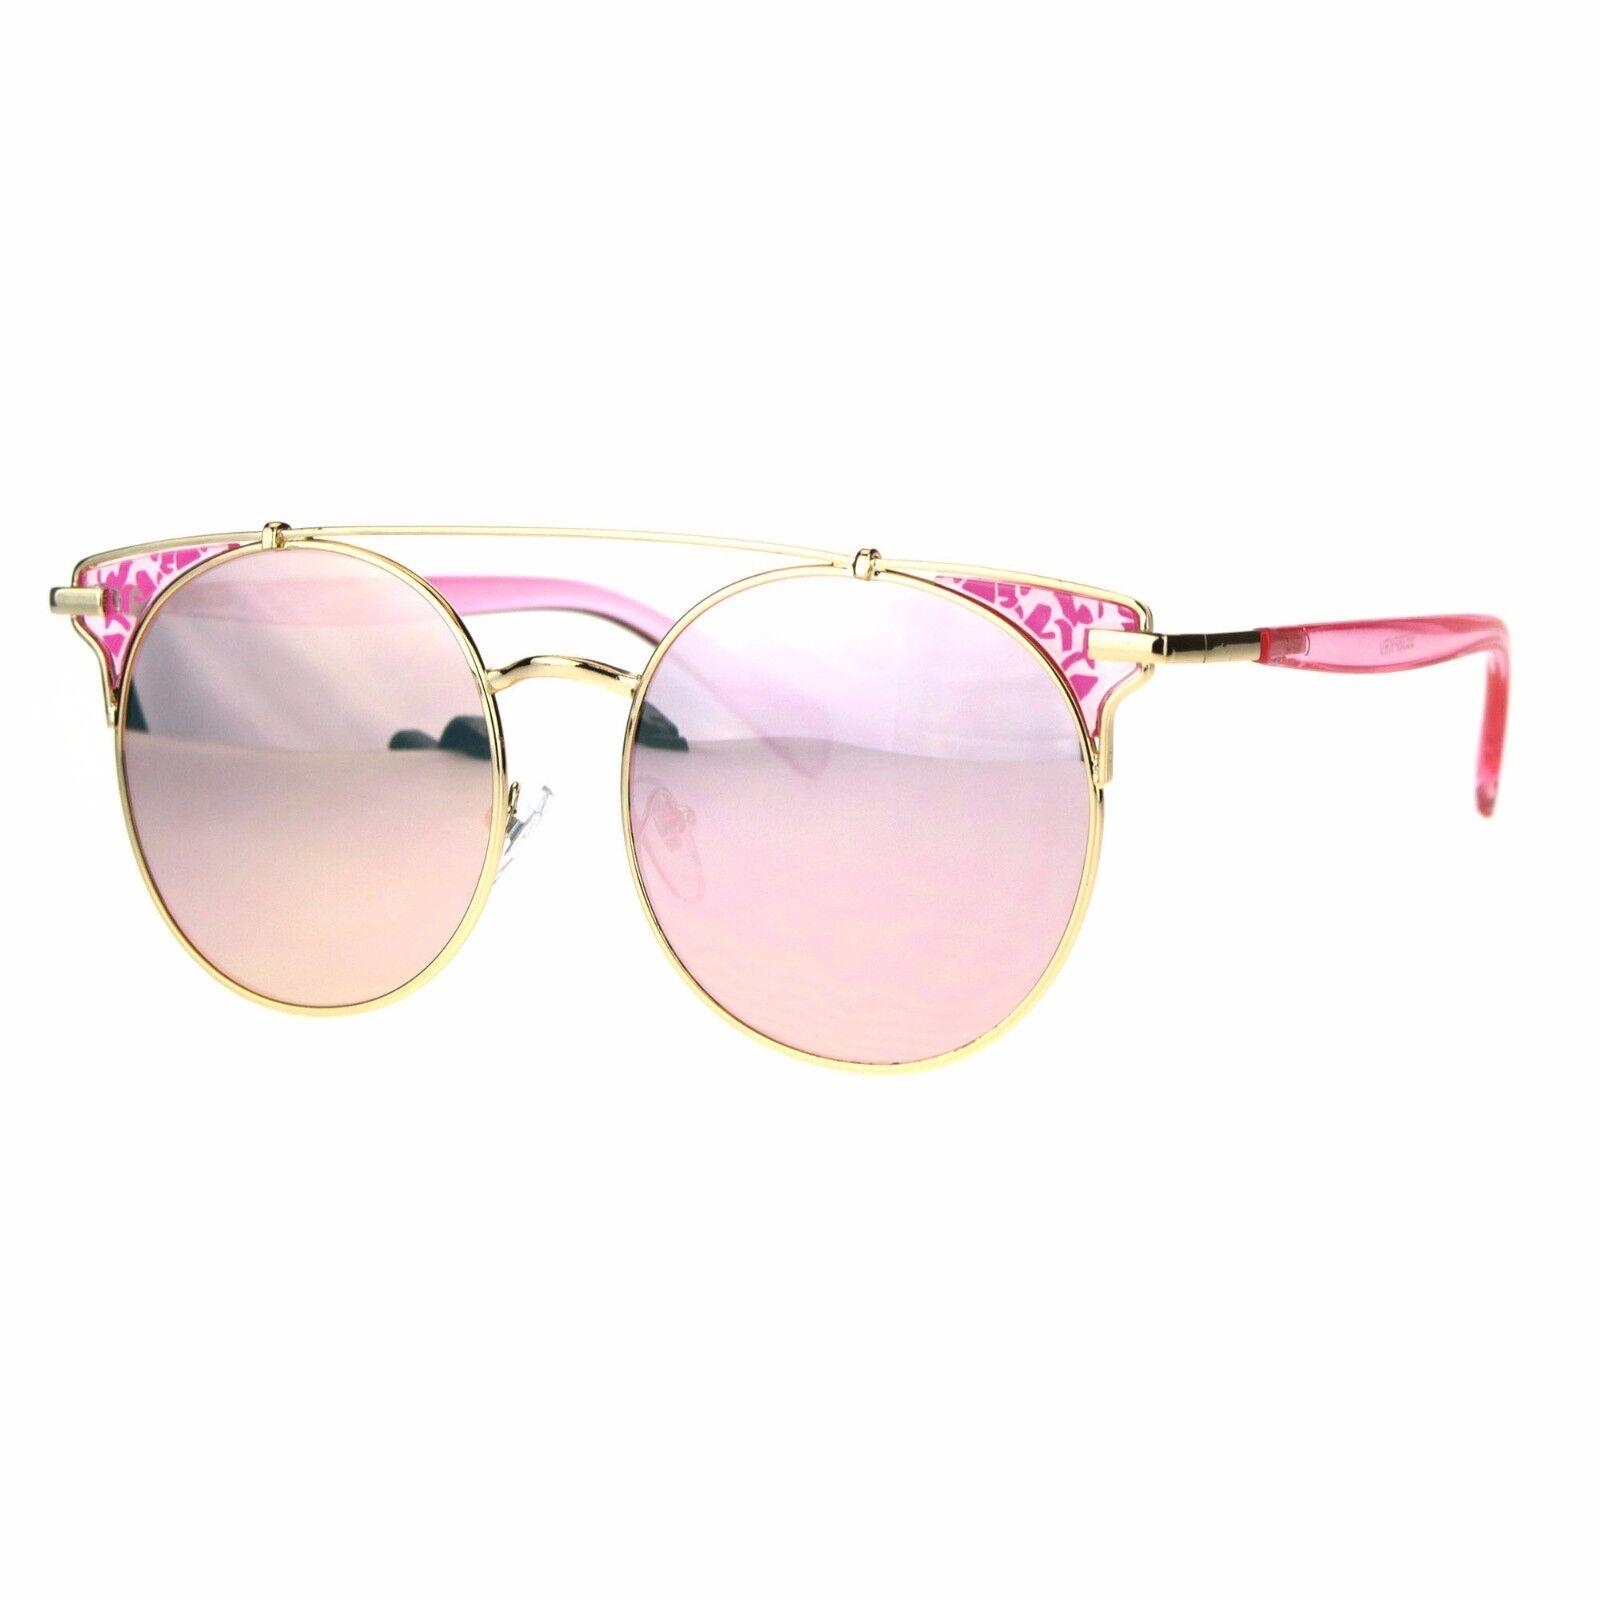 Womens Fashion Sunglasses Flat Top Gold Pink Frame Pink Mirr